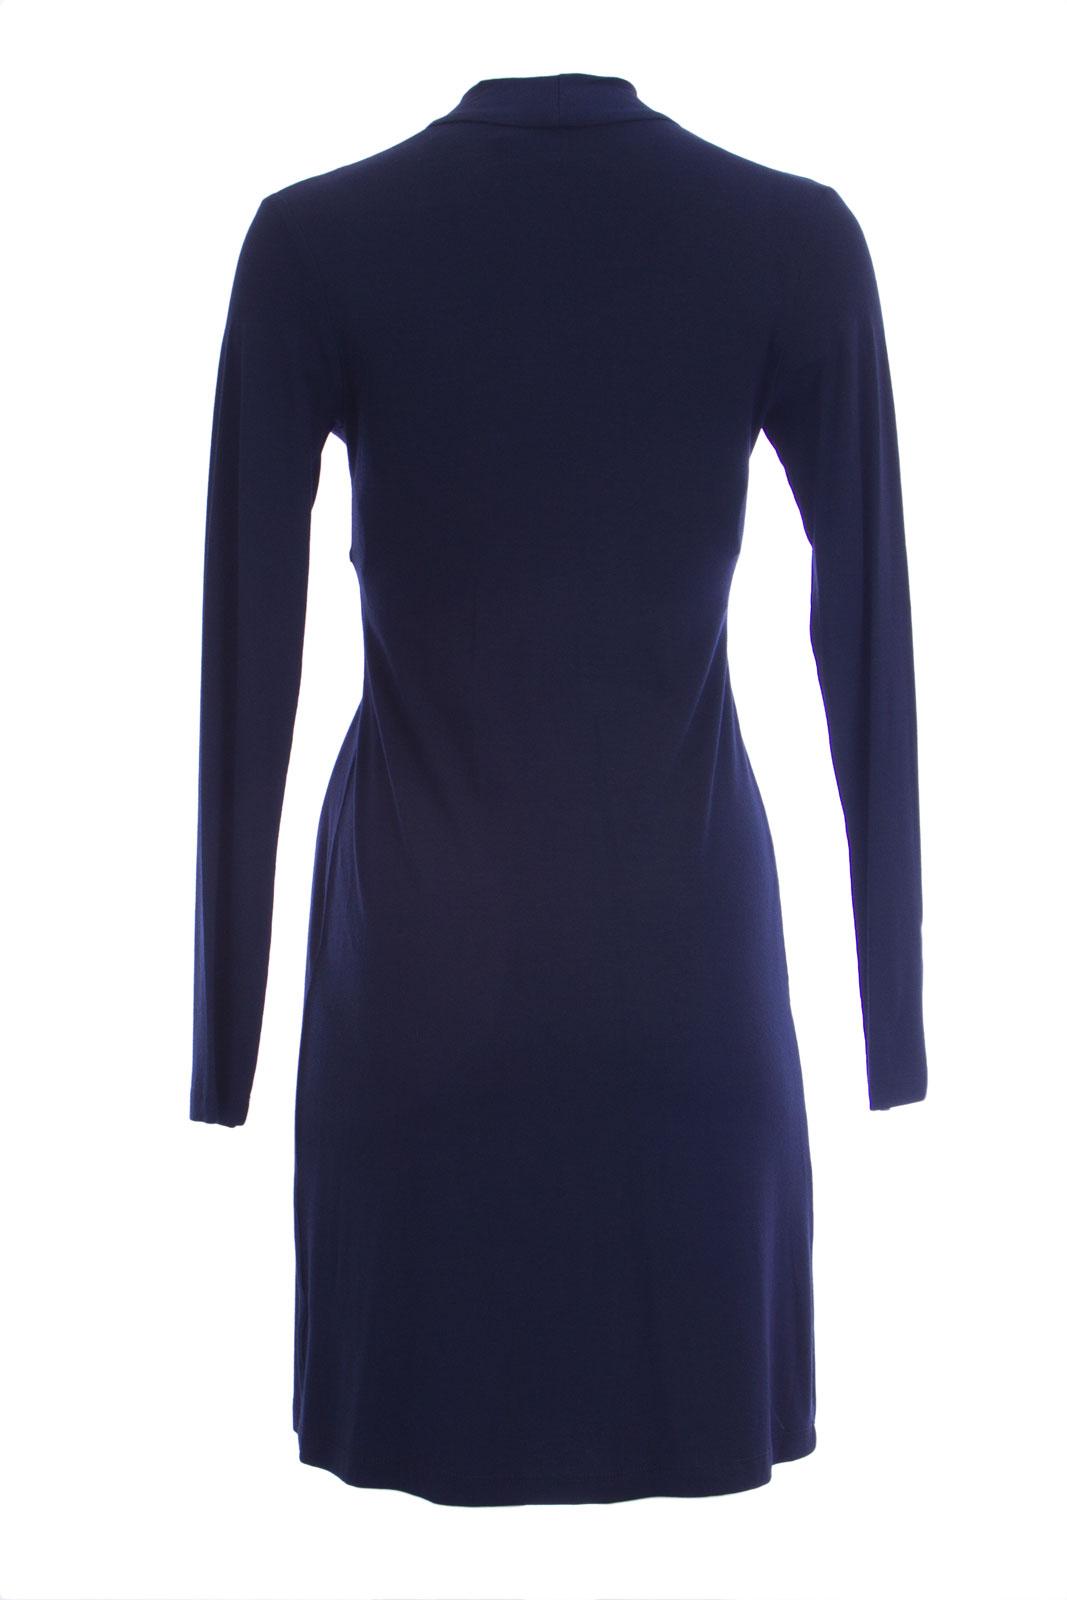 Olian maternity womens knot accent long sleeve dress 125 nwt ebay olian maternity women 039 s knot accent long ombrellifo Choice Image